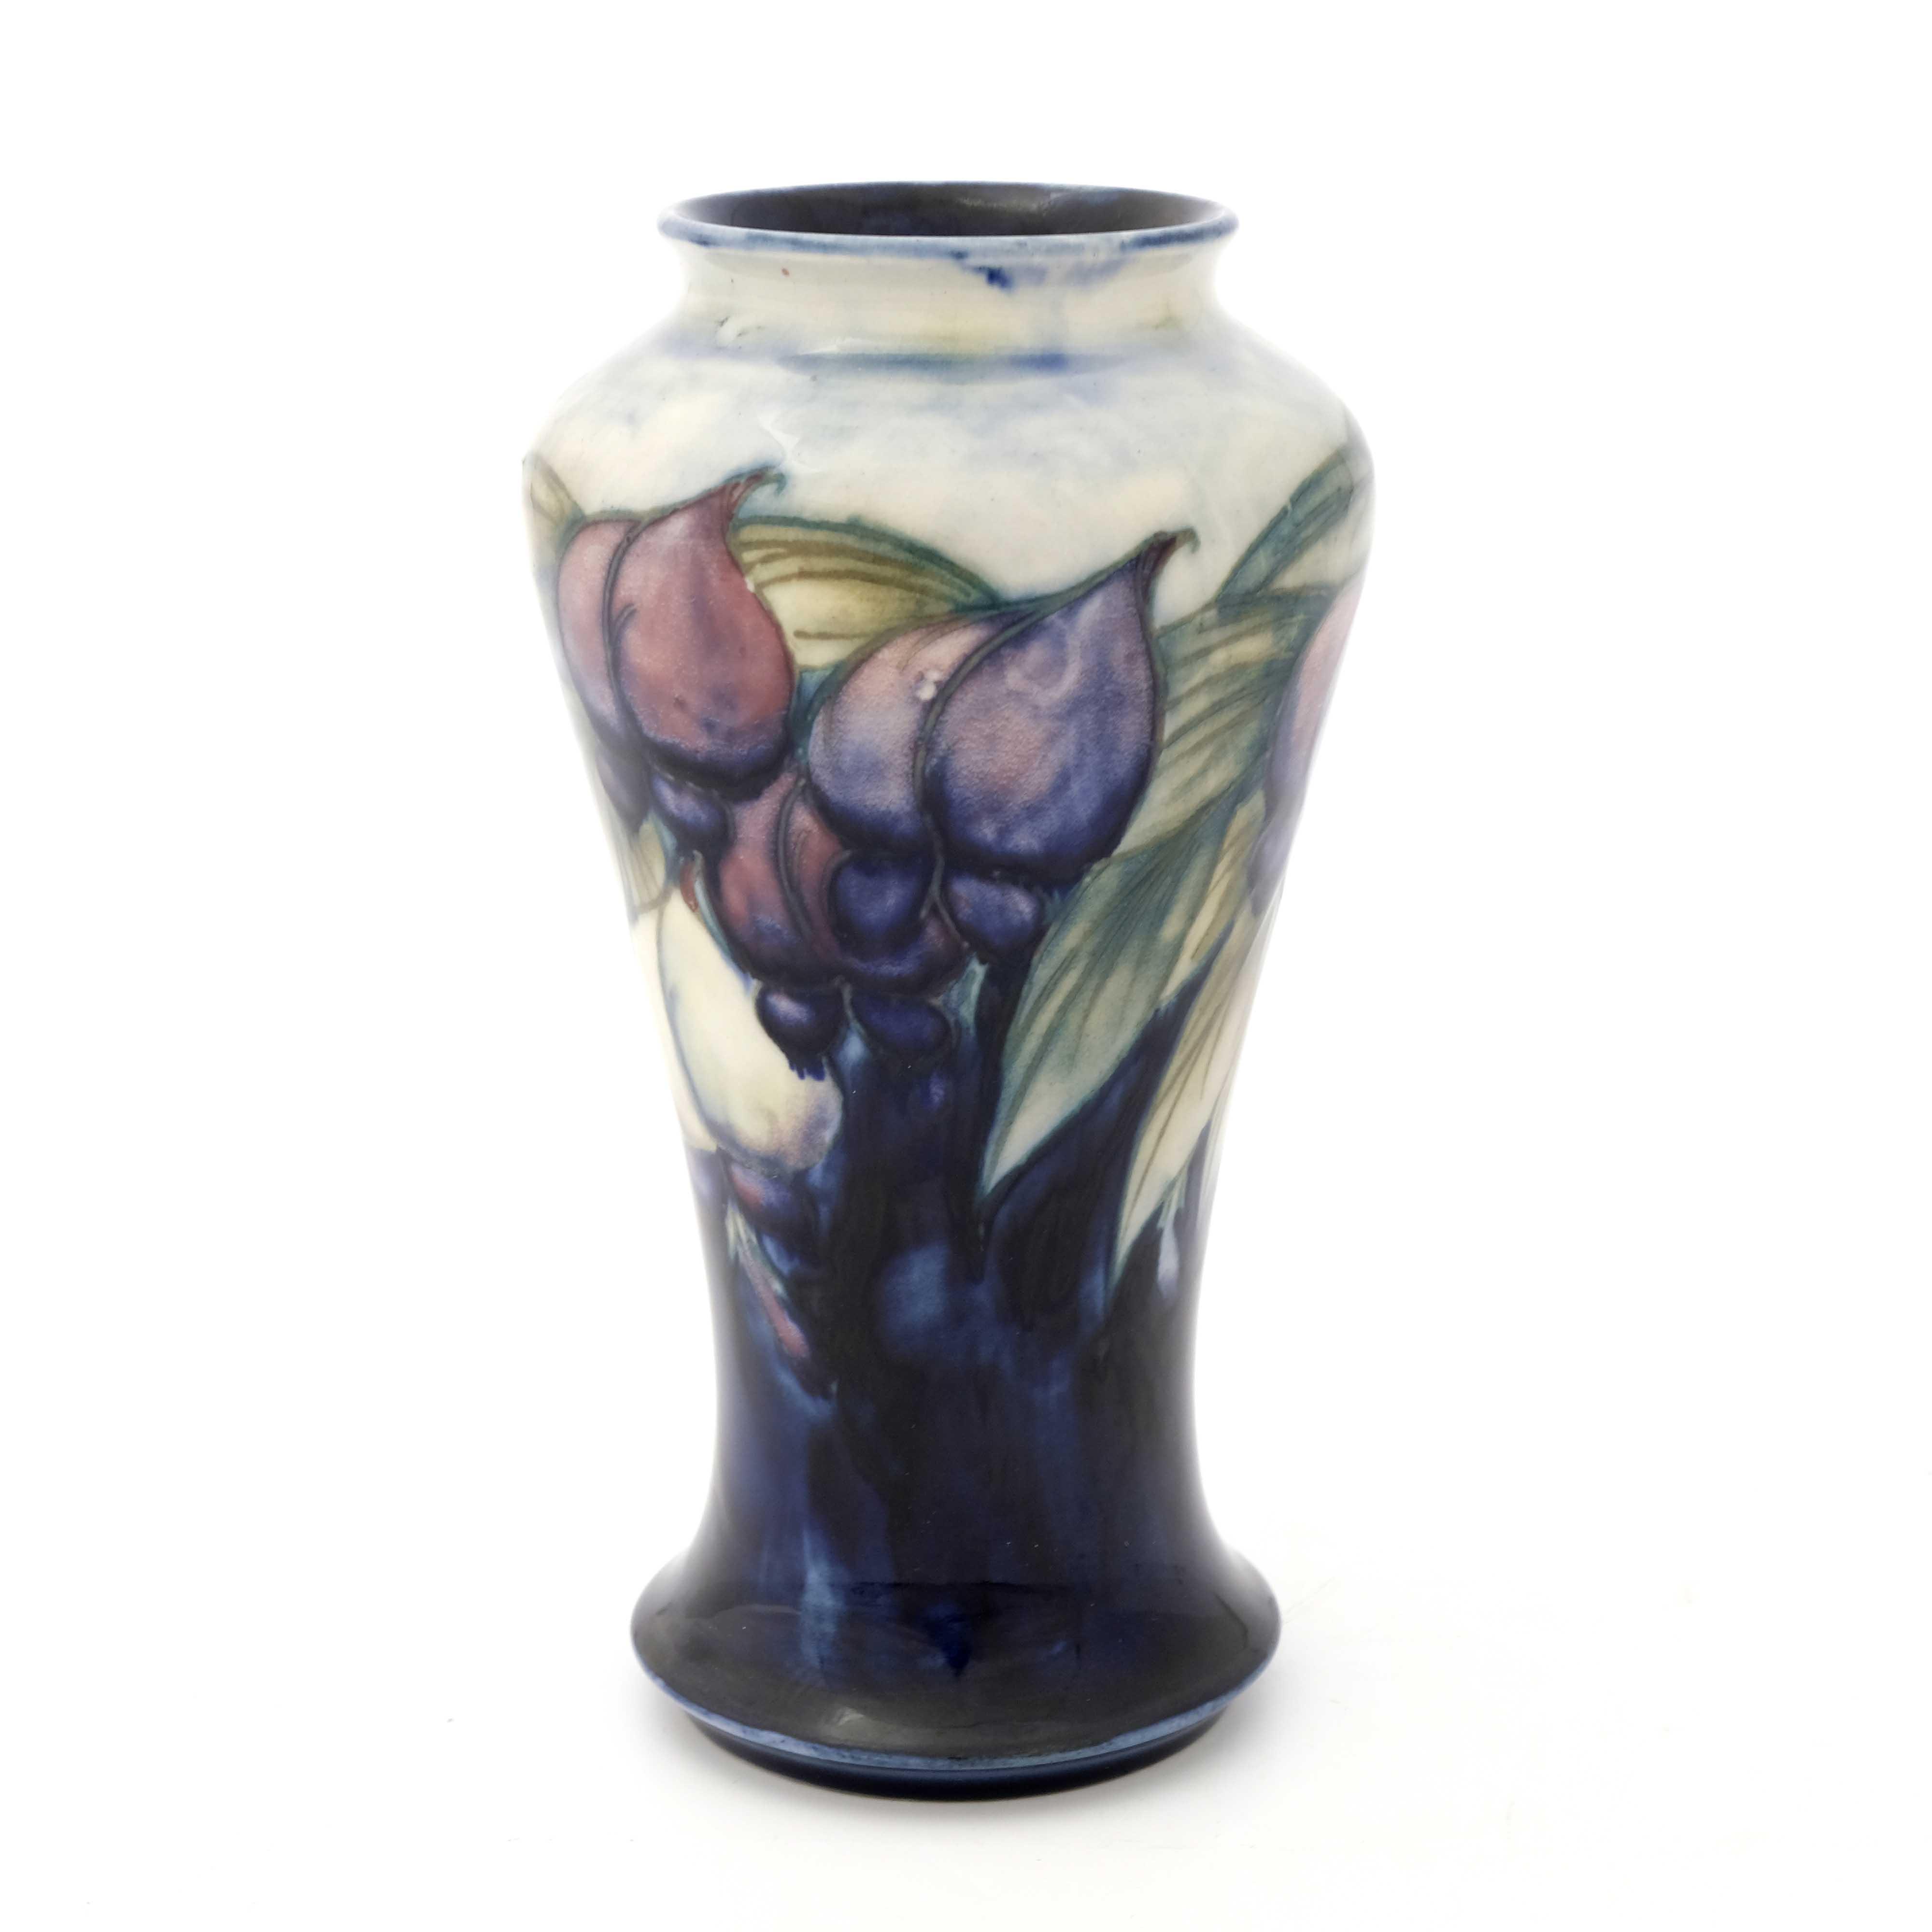 William Moorcroft, a Wisteria vase - Image 3 of 5